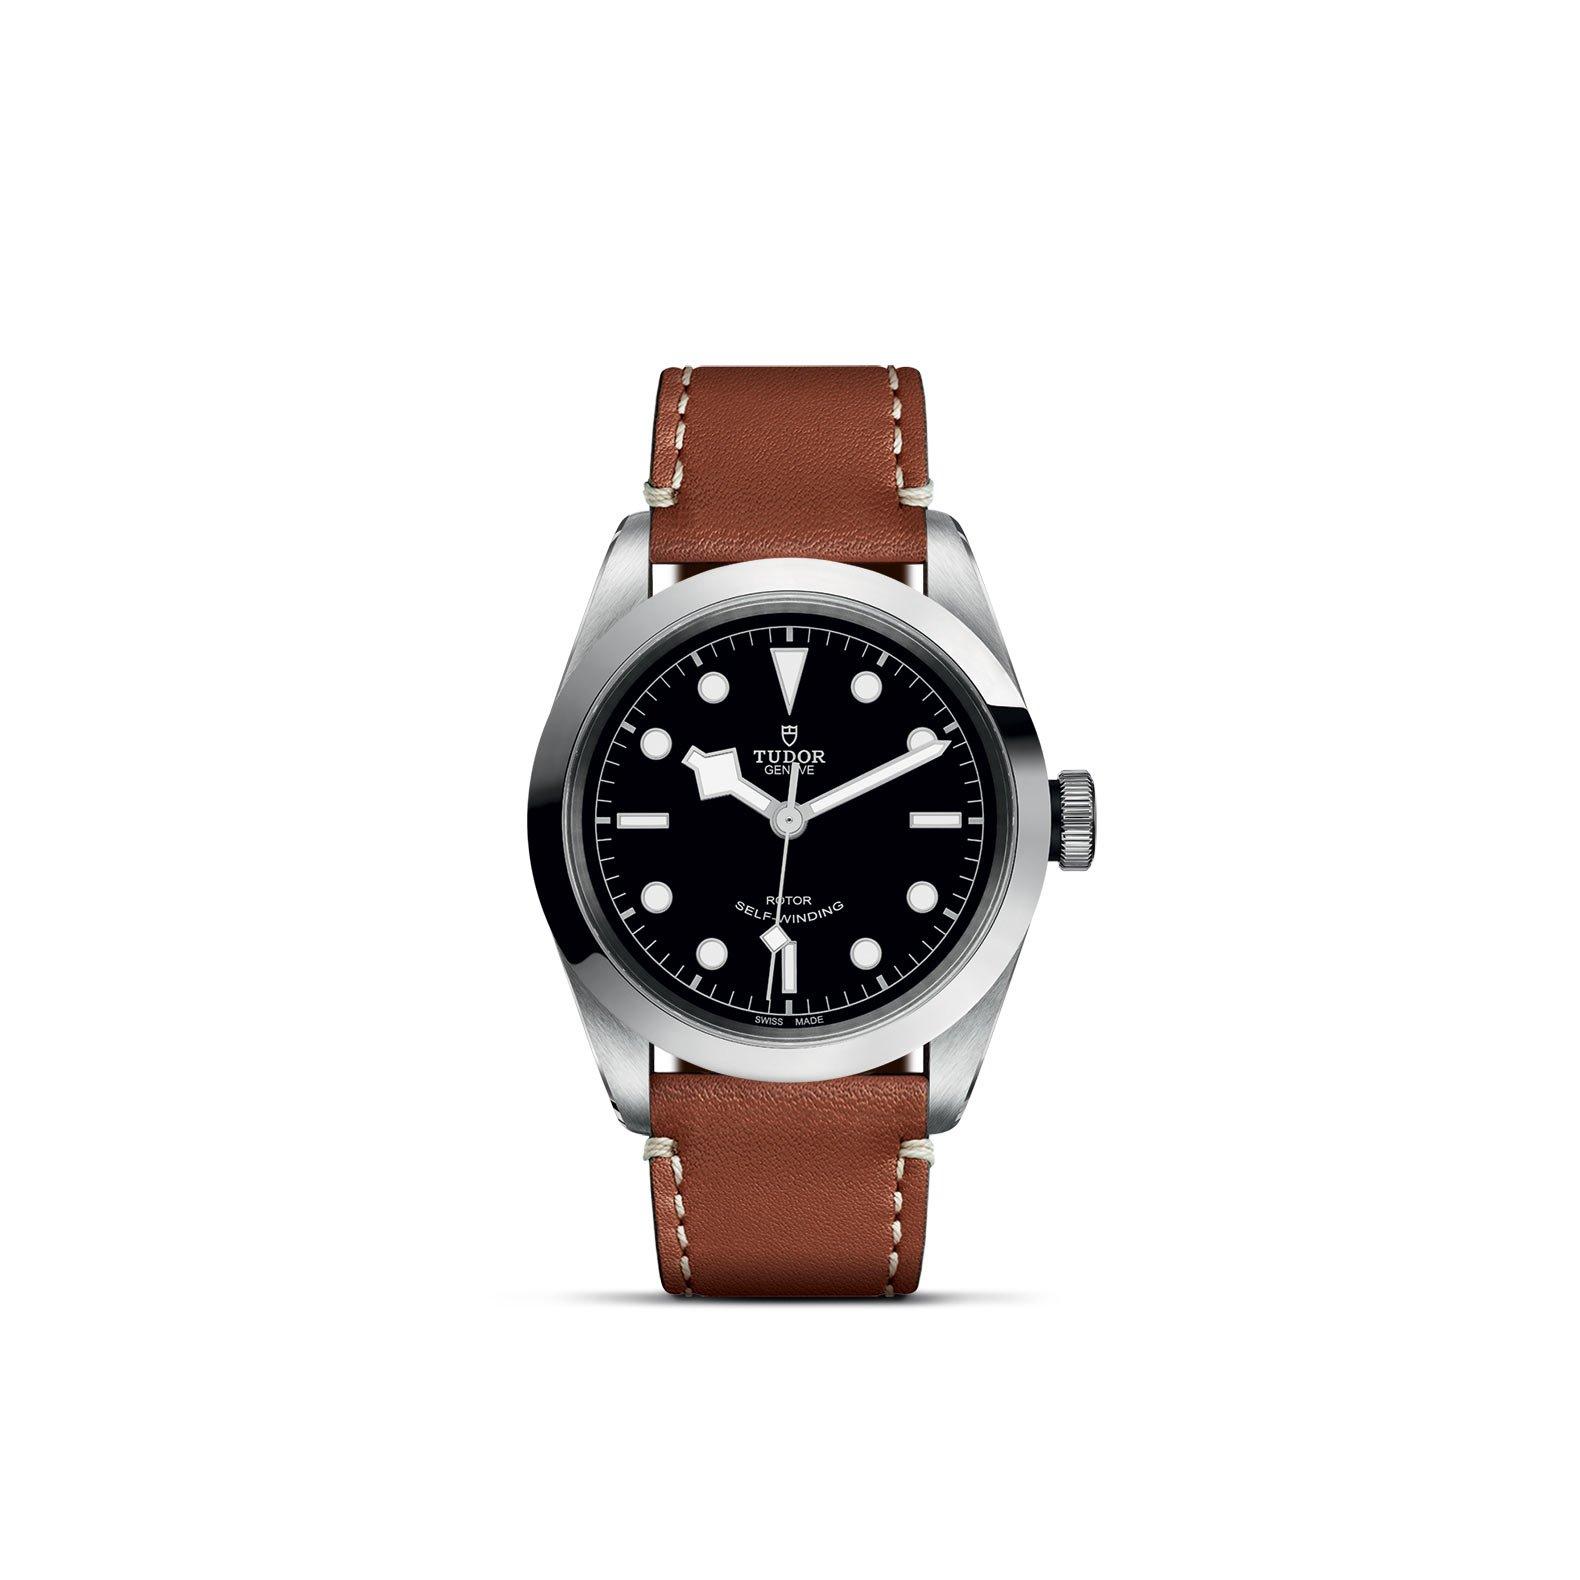 Montre TUDOR Black Bay 41 boîtier en acier, 41mm, bracelet en cuir brun vue 1